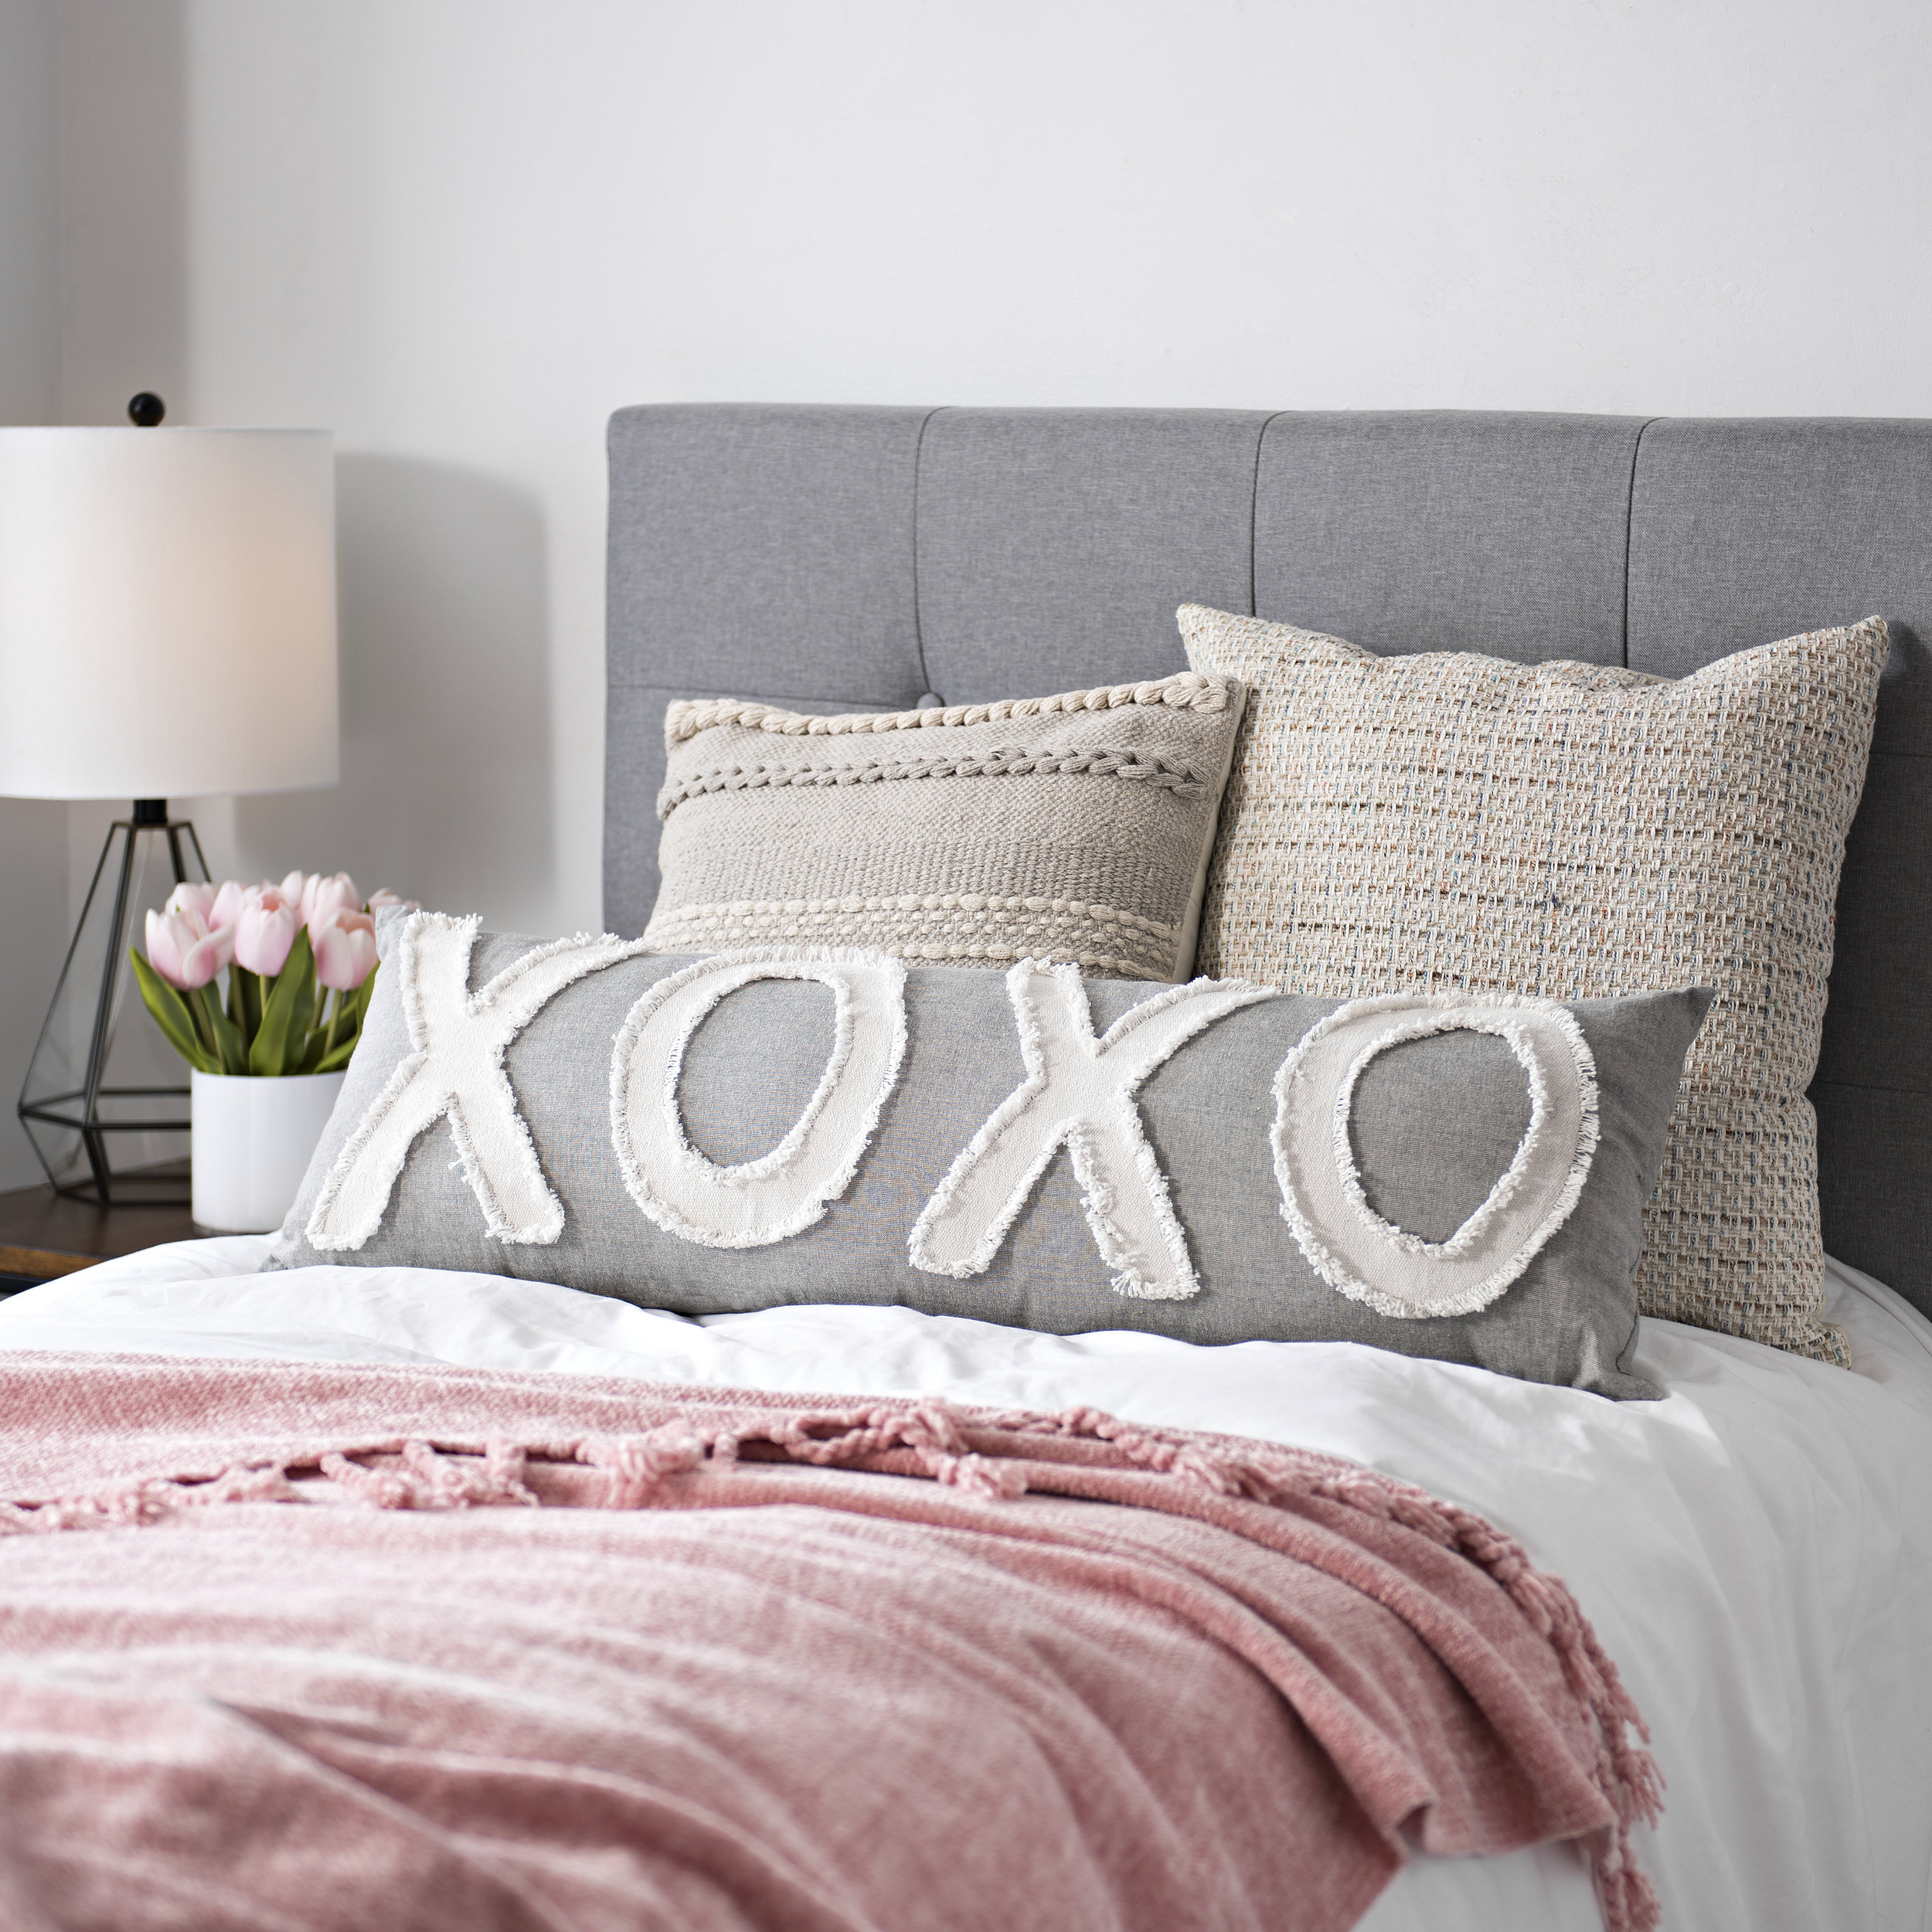 Kirkland's - Mix & Match | Tips & Tricks for Throw Pillows